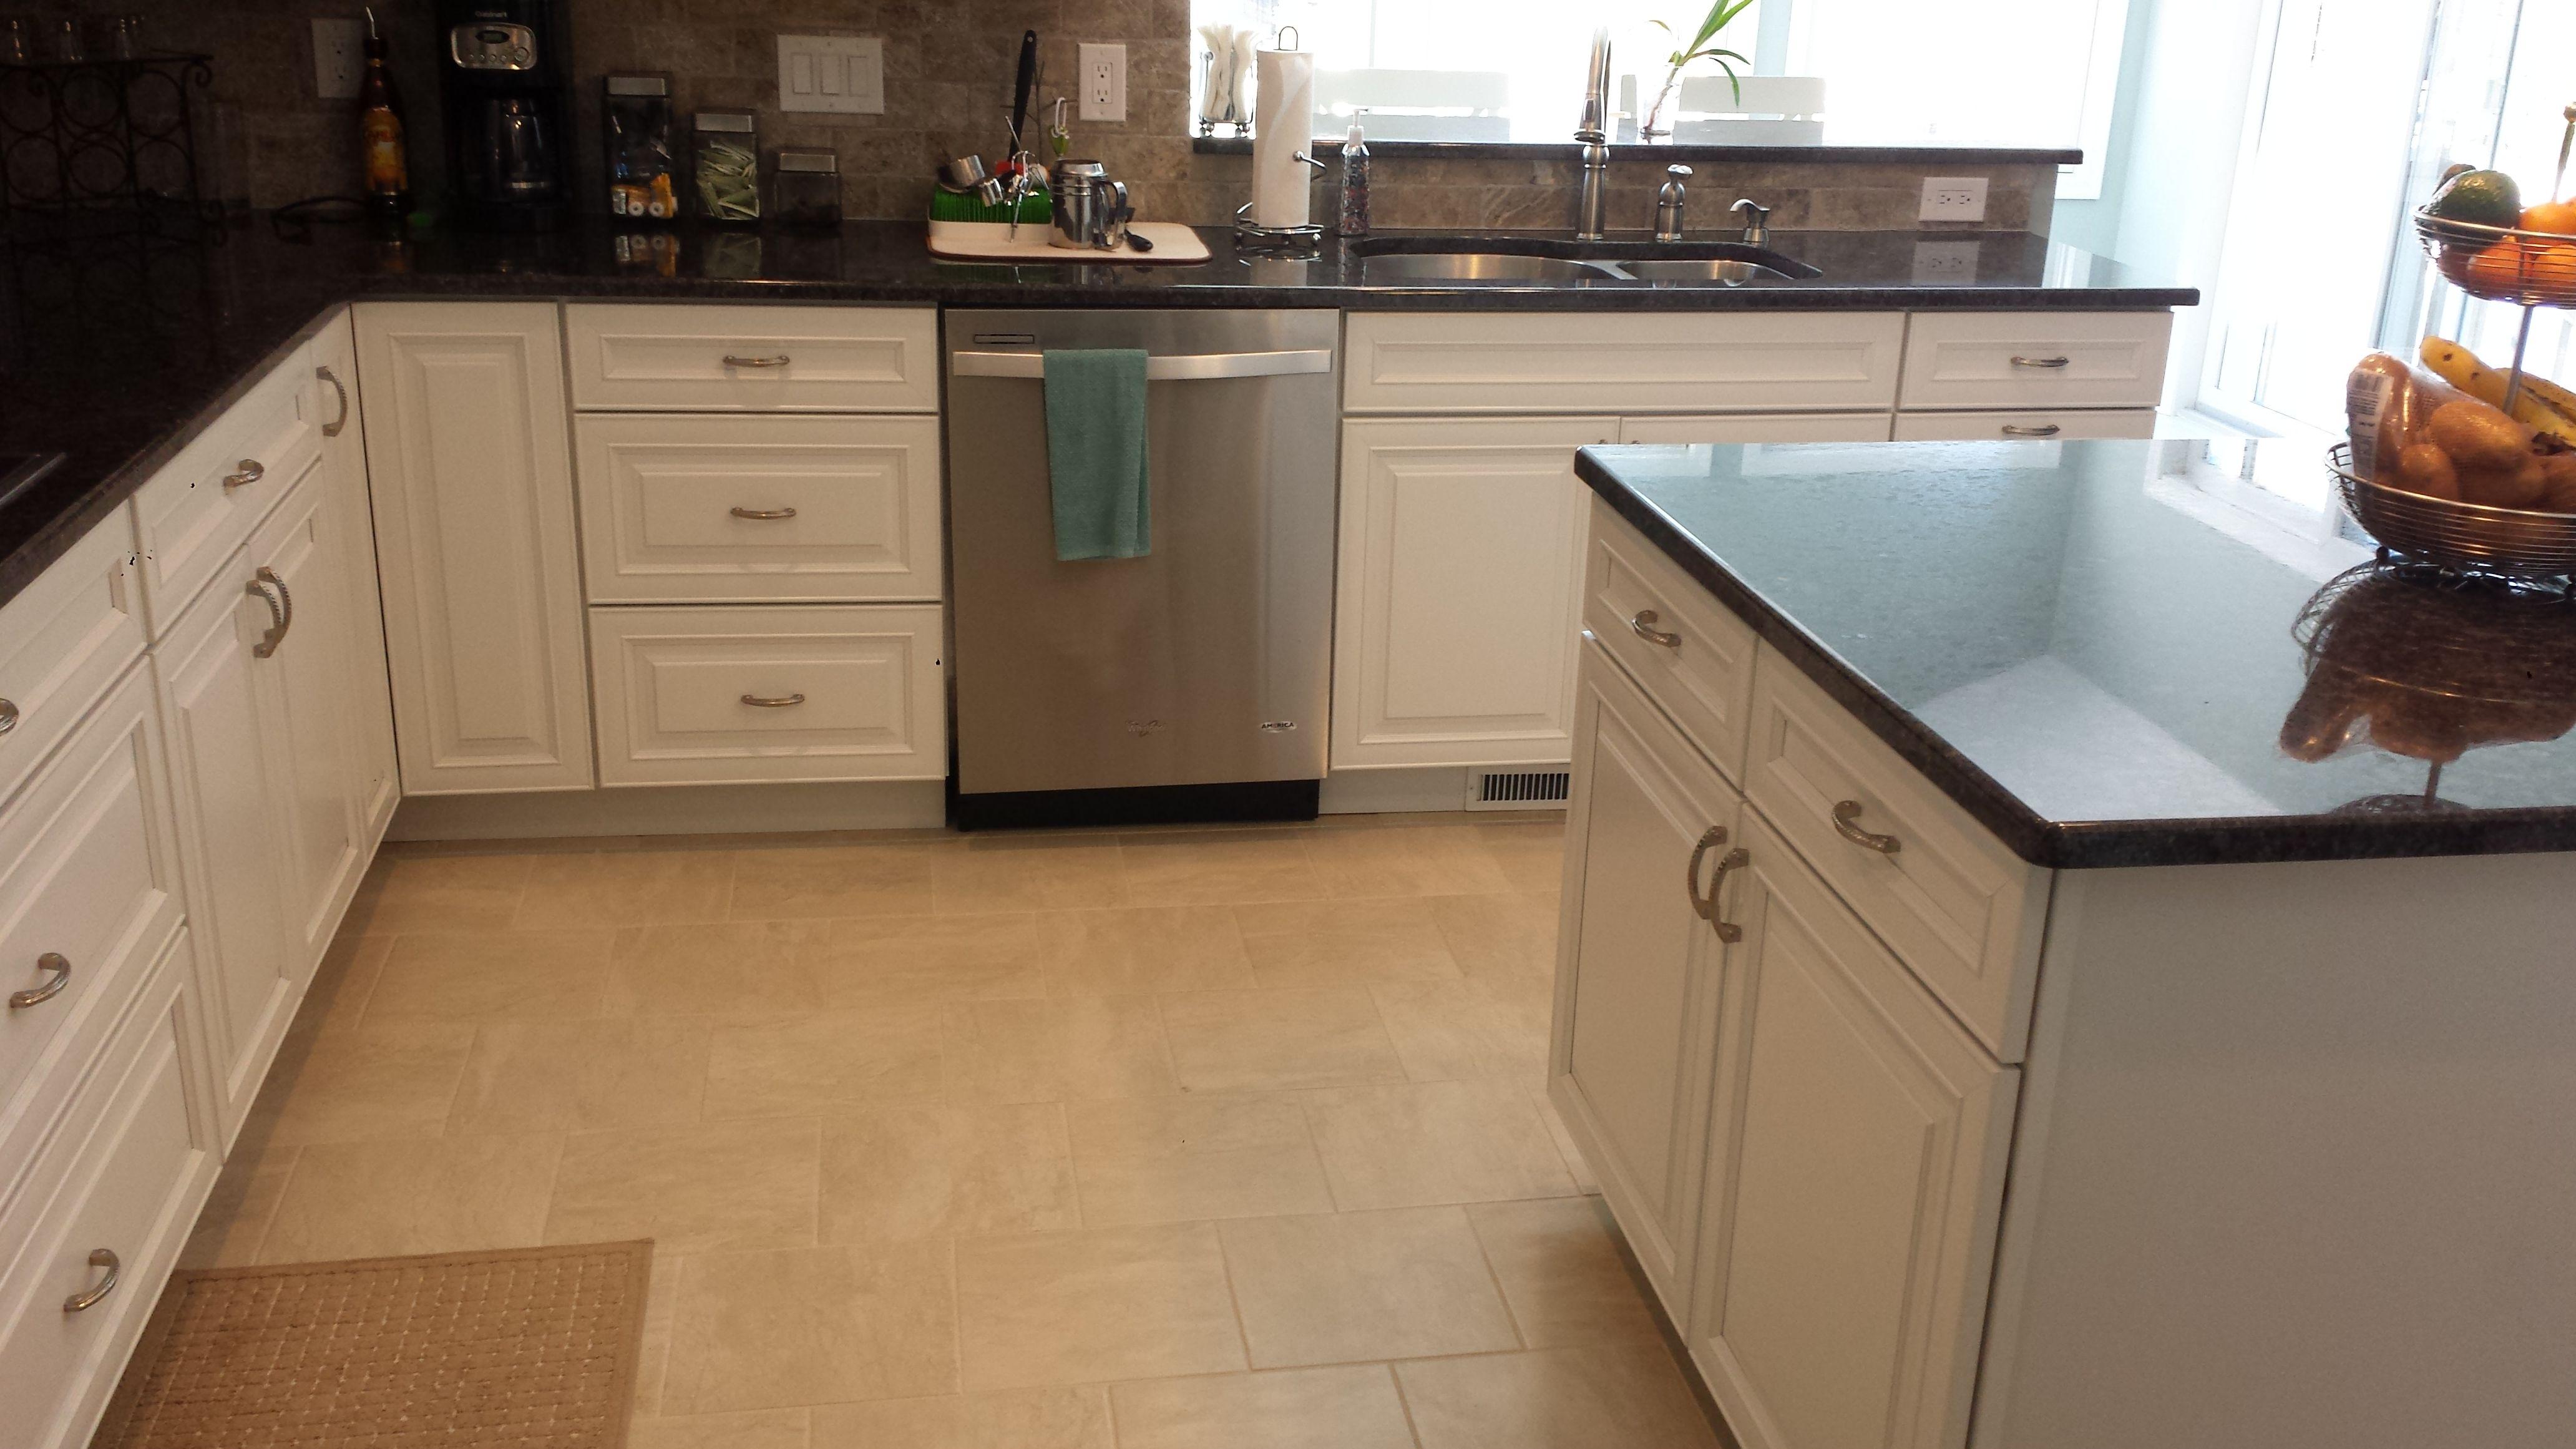 Nice Streater Kitchen Designed By Thomas Matteo #kitchen #kraftmaid #cabinets  #dishwasher #granite